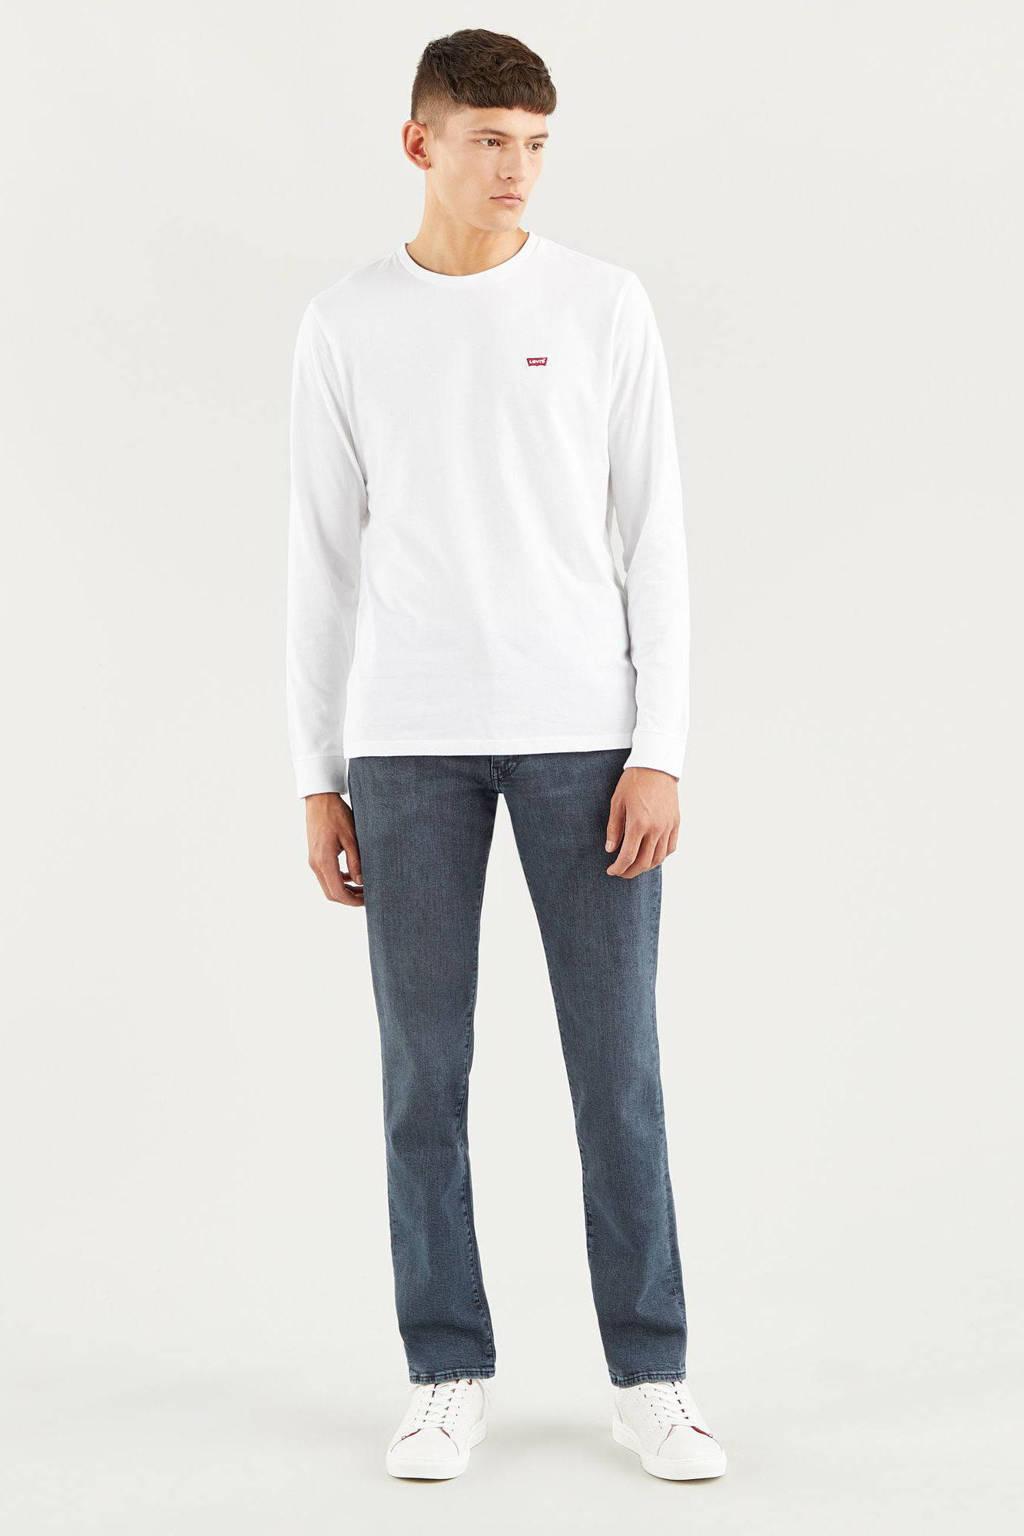 Levi's 511 slim fit jeans richmond blue black od adv, RICHMOND BLUE BLACK OD ADV